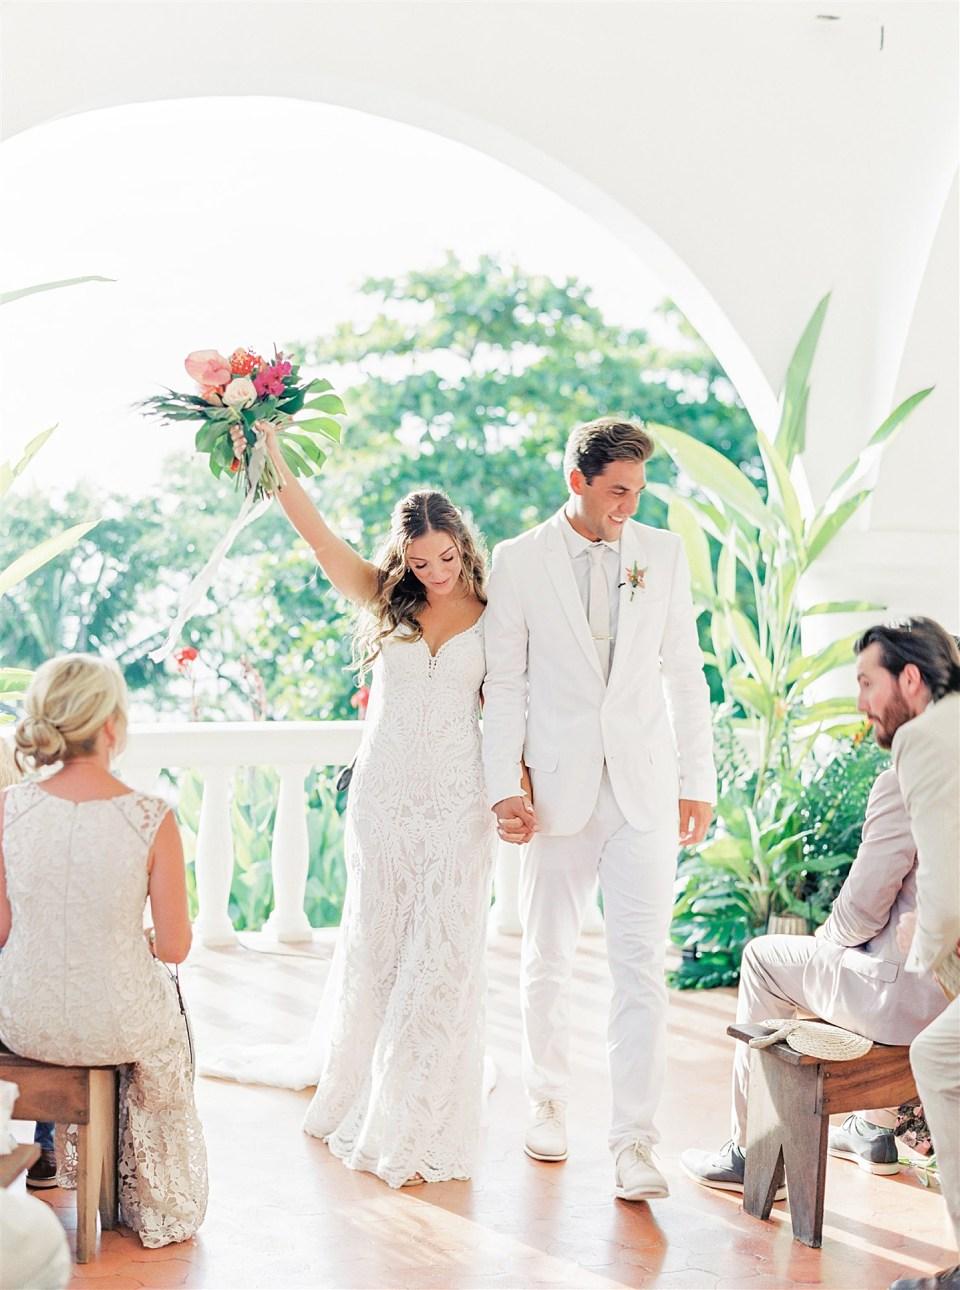 Magi Scotts Nosara Wedding by Lauren Fair 0073